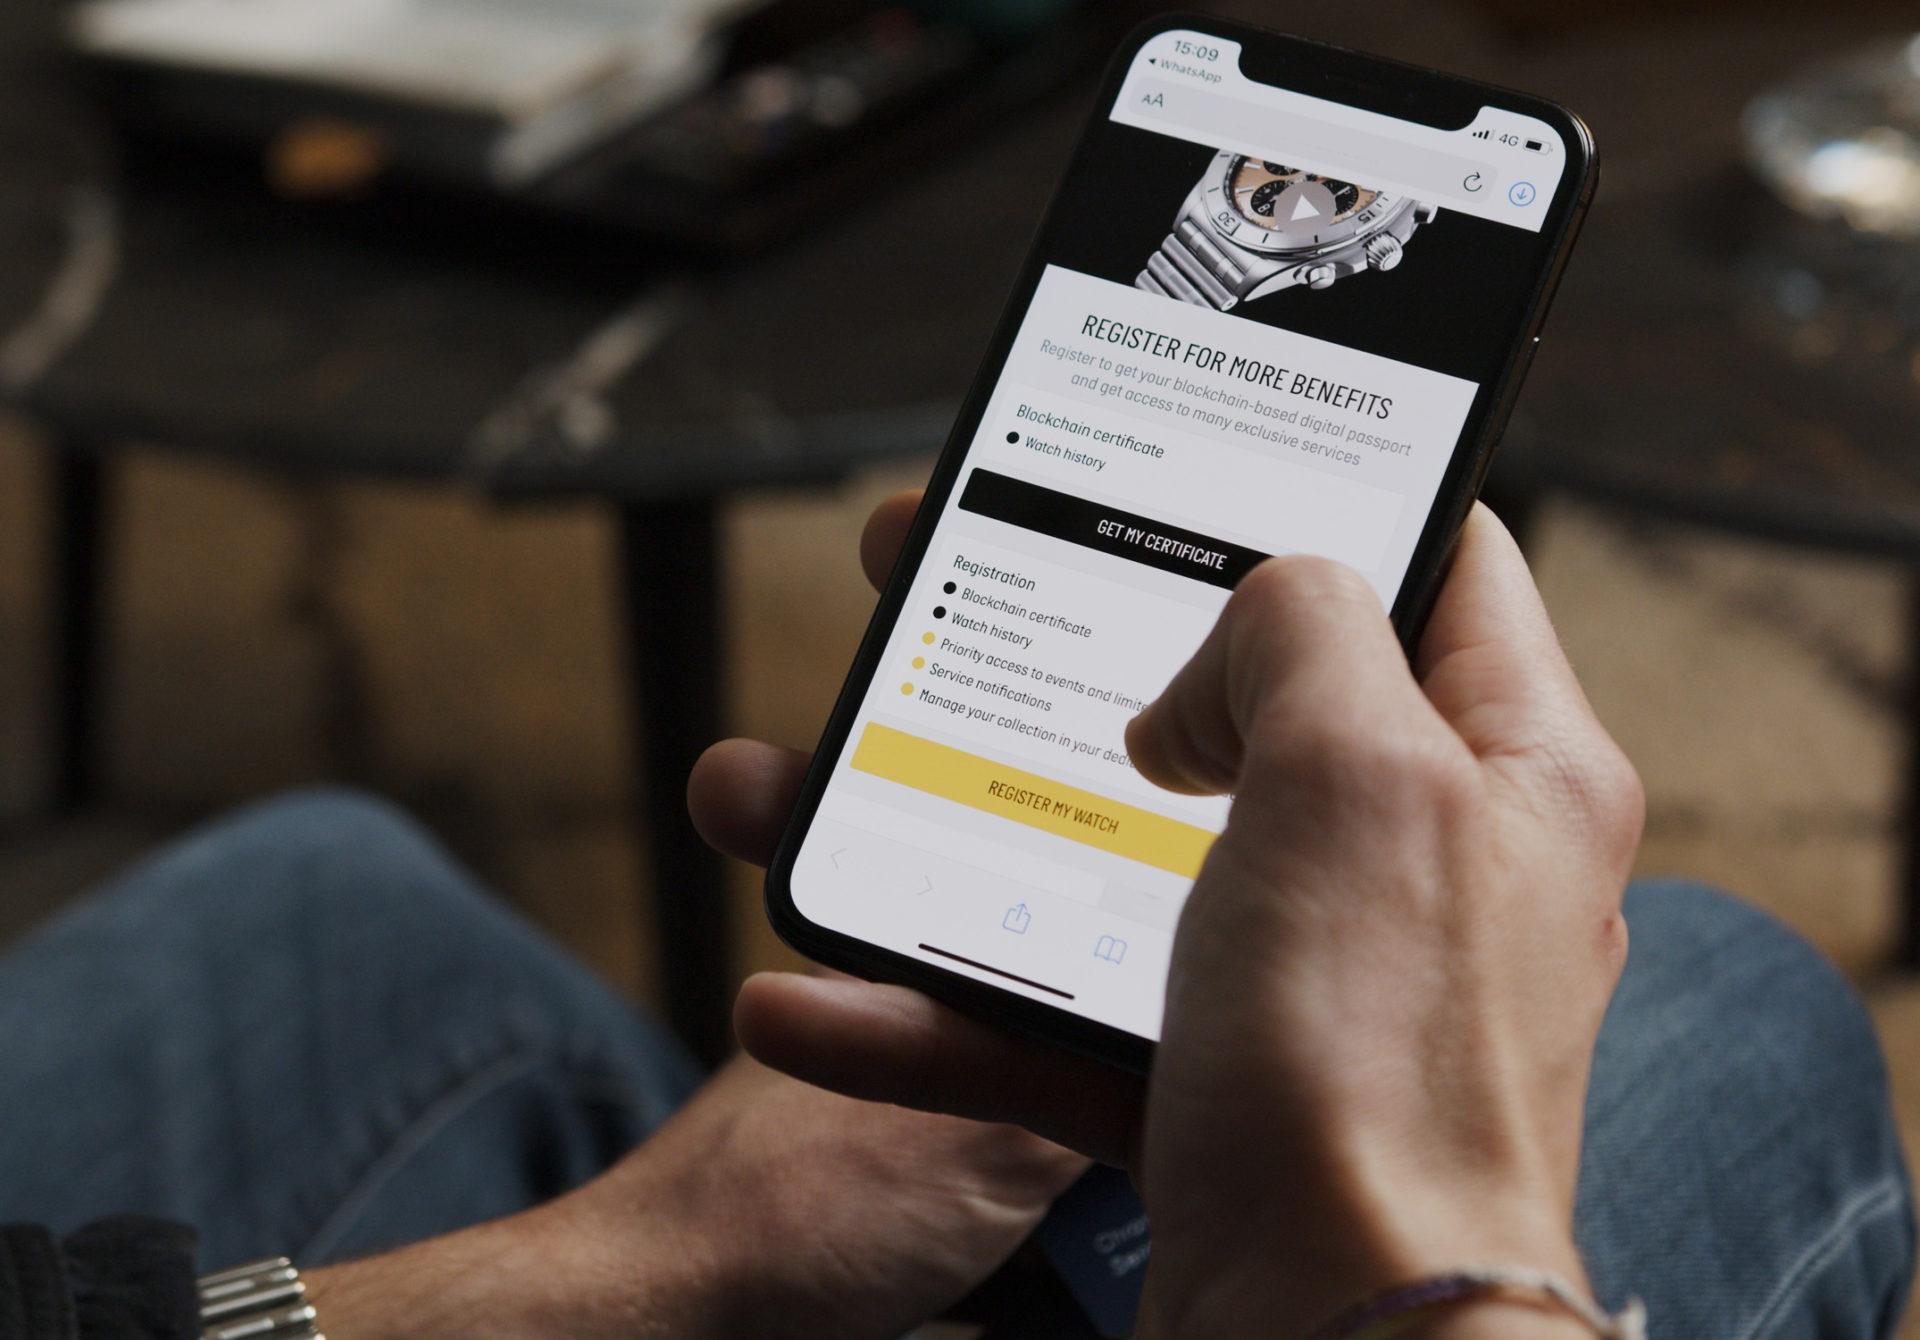 Breitling's Digital Passport based on Blockchain